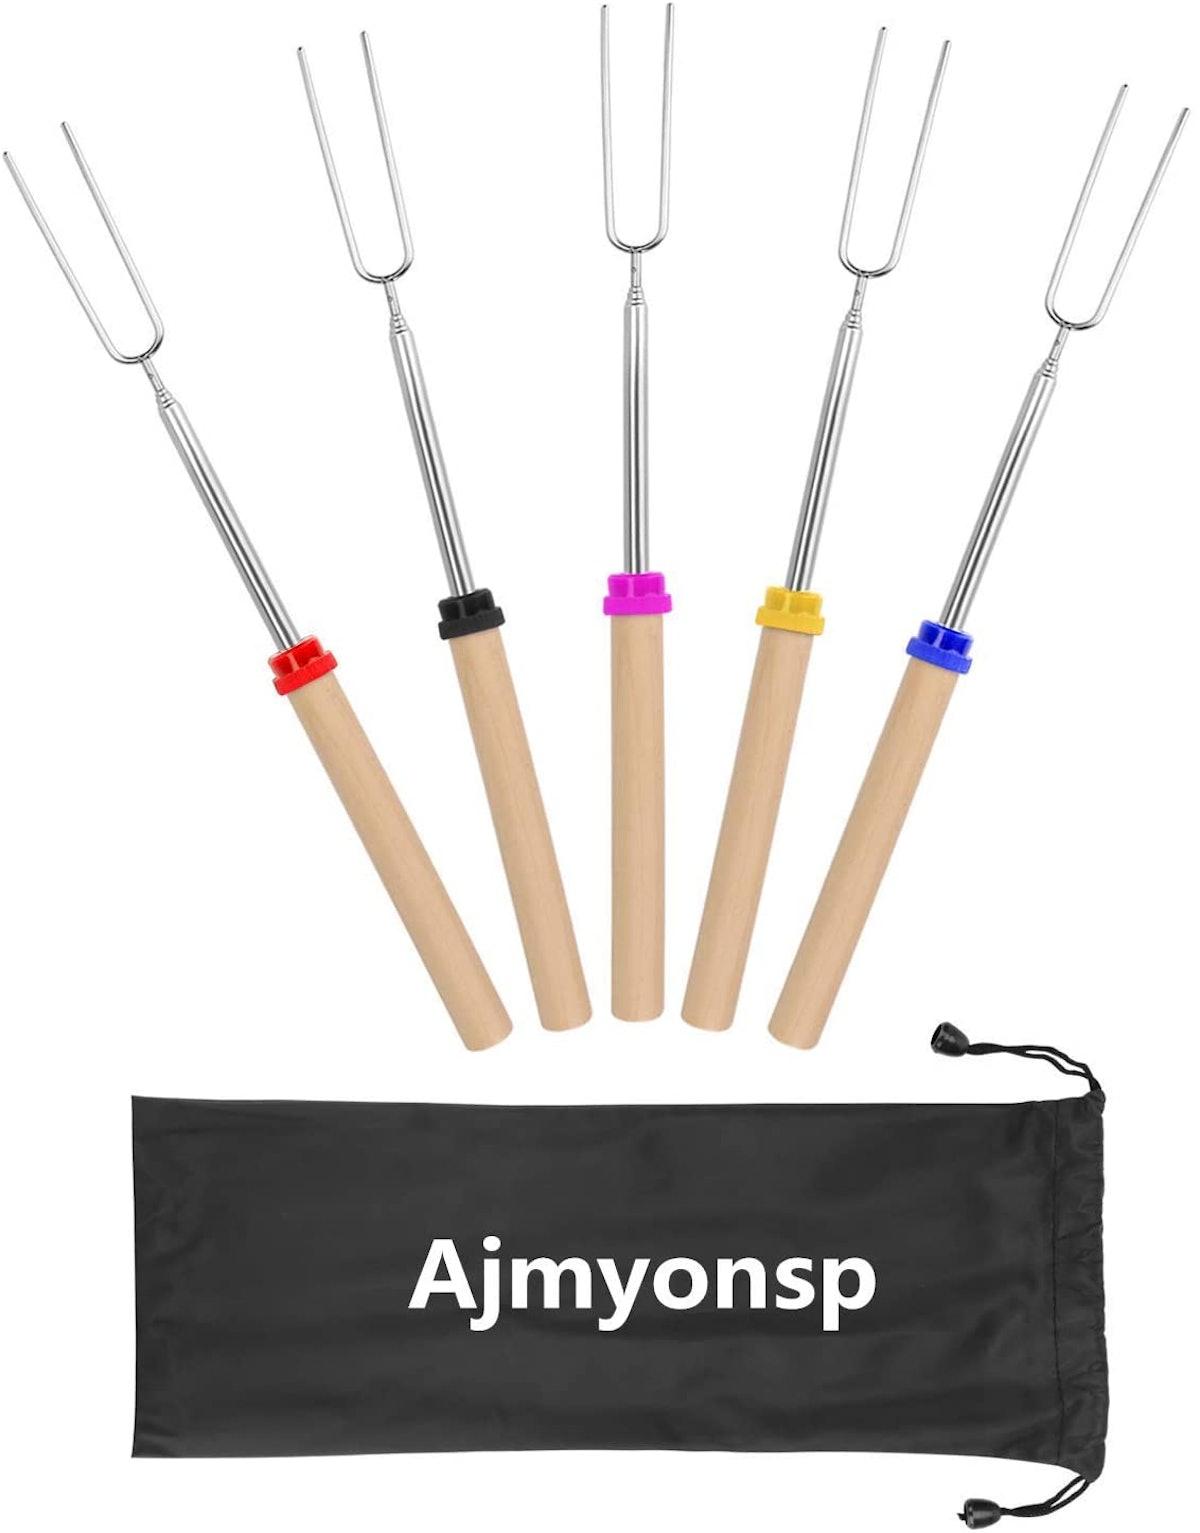 Ajmyonsp Marshmallow Roasting Sticks 5pcs